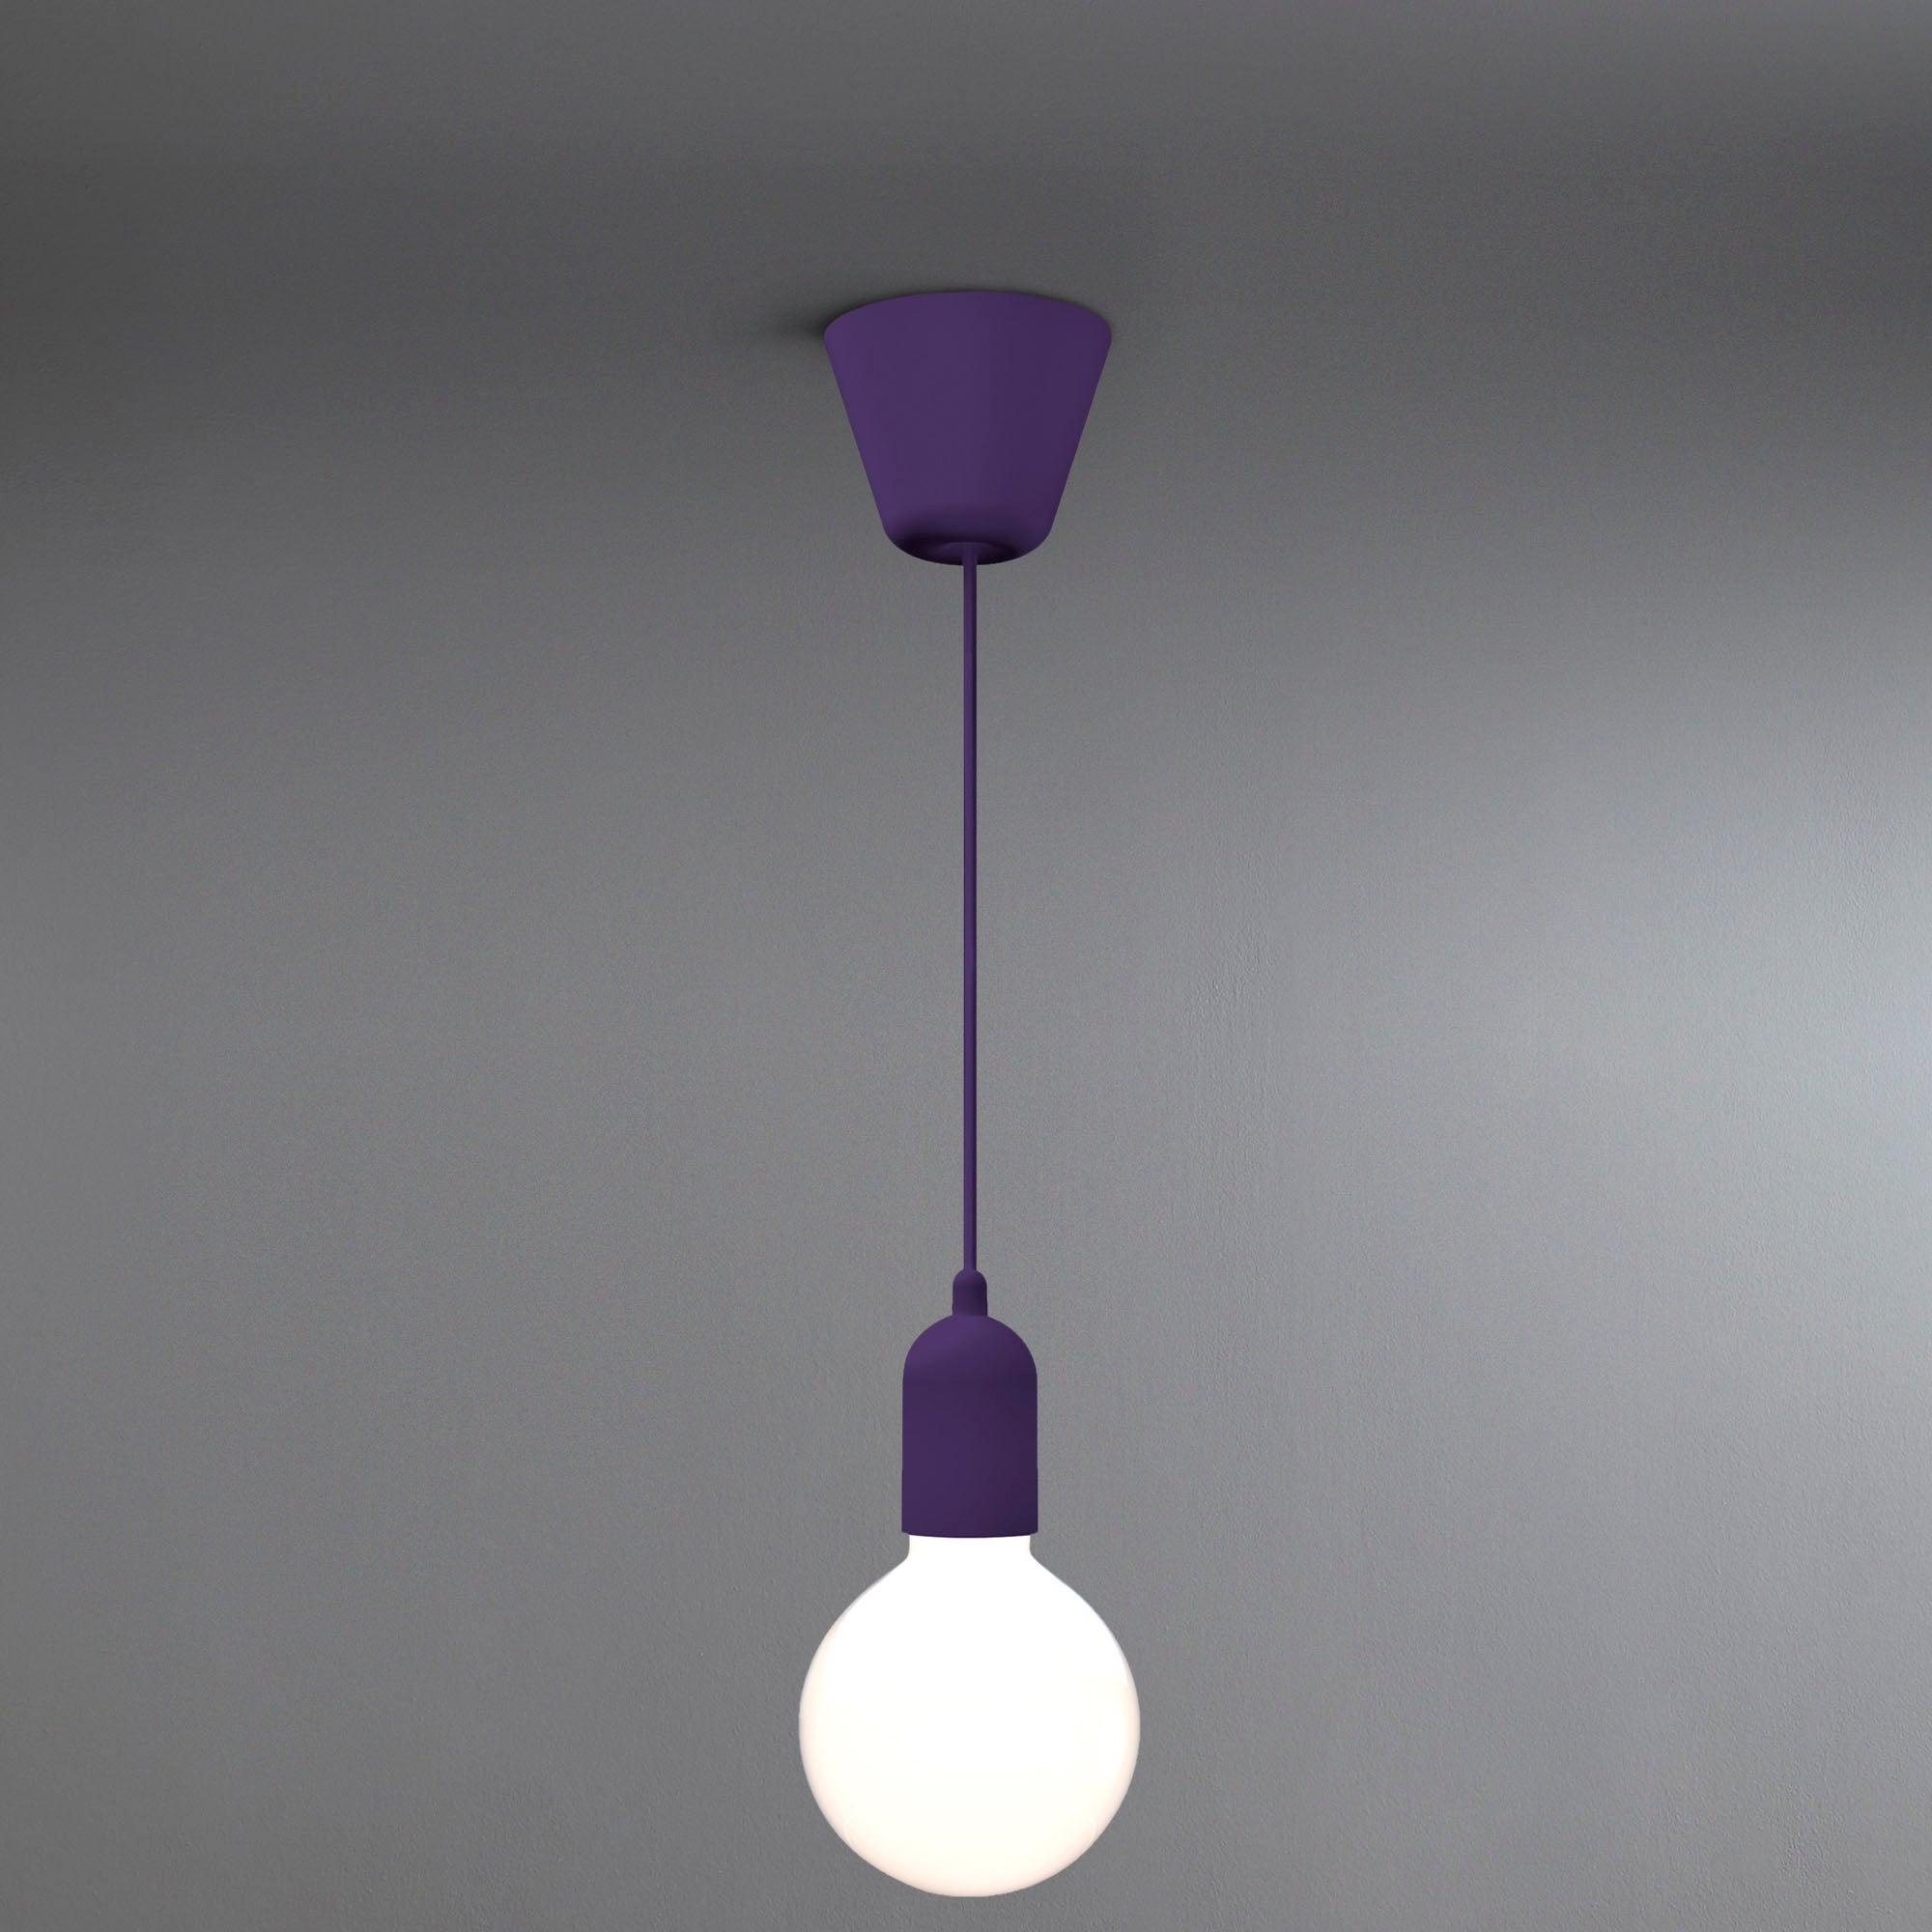 Image of Funk Suspension Purple Light Fitting Purple